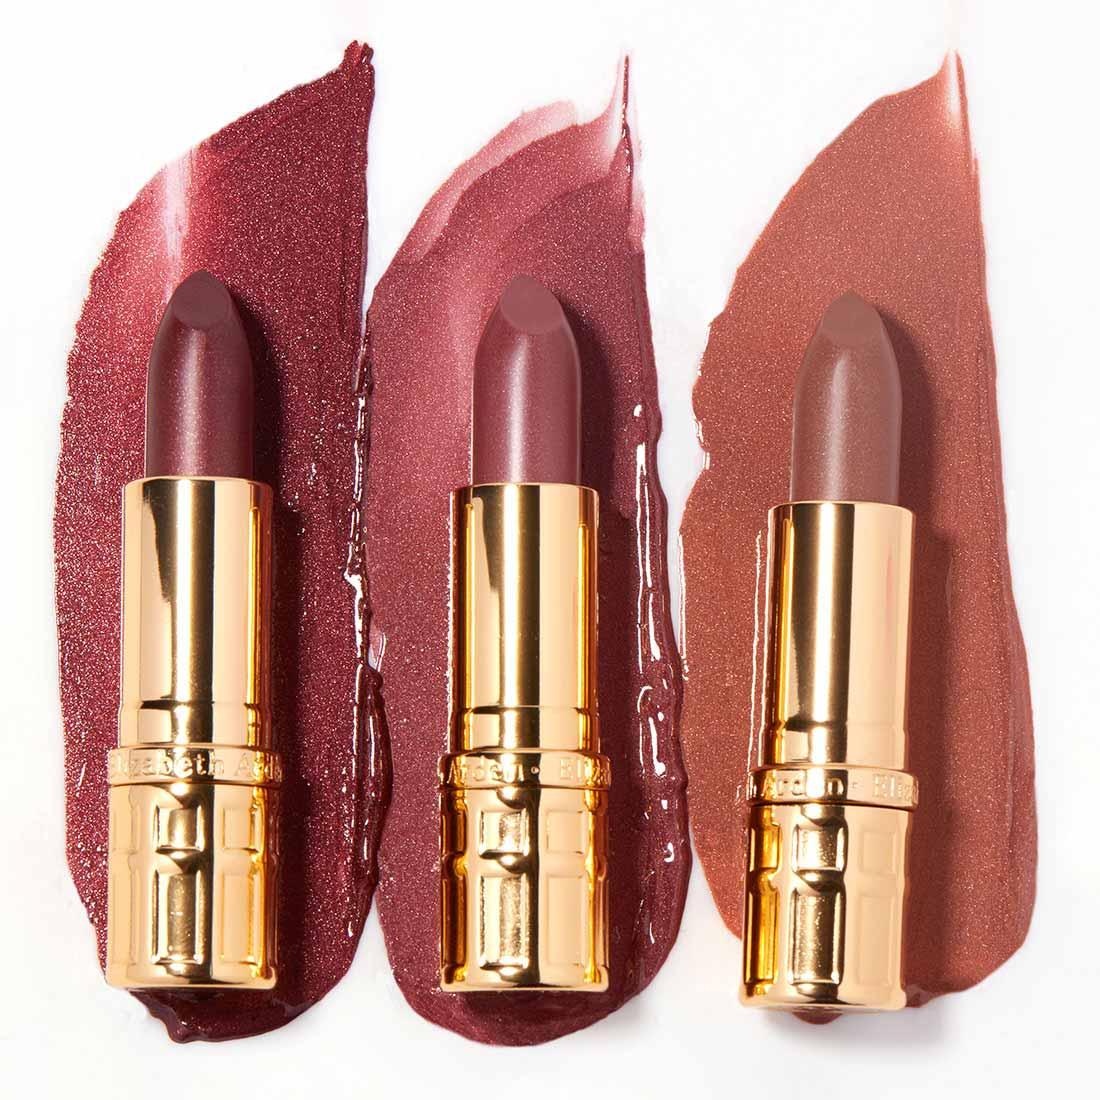 Elizabeth Lip Makeup Products